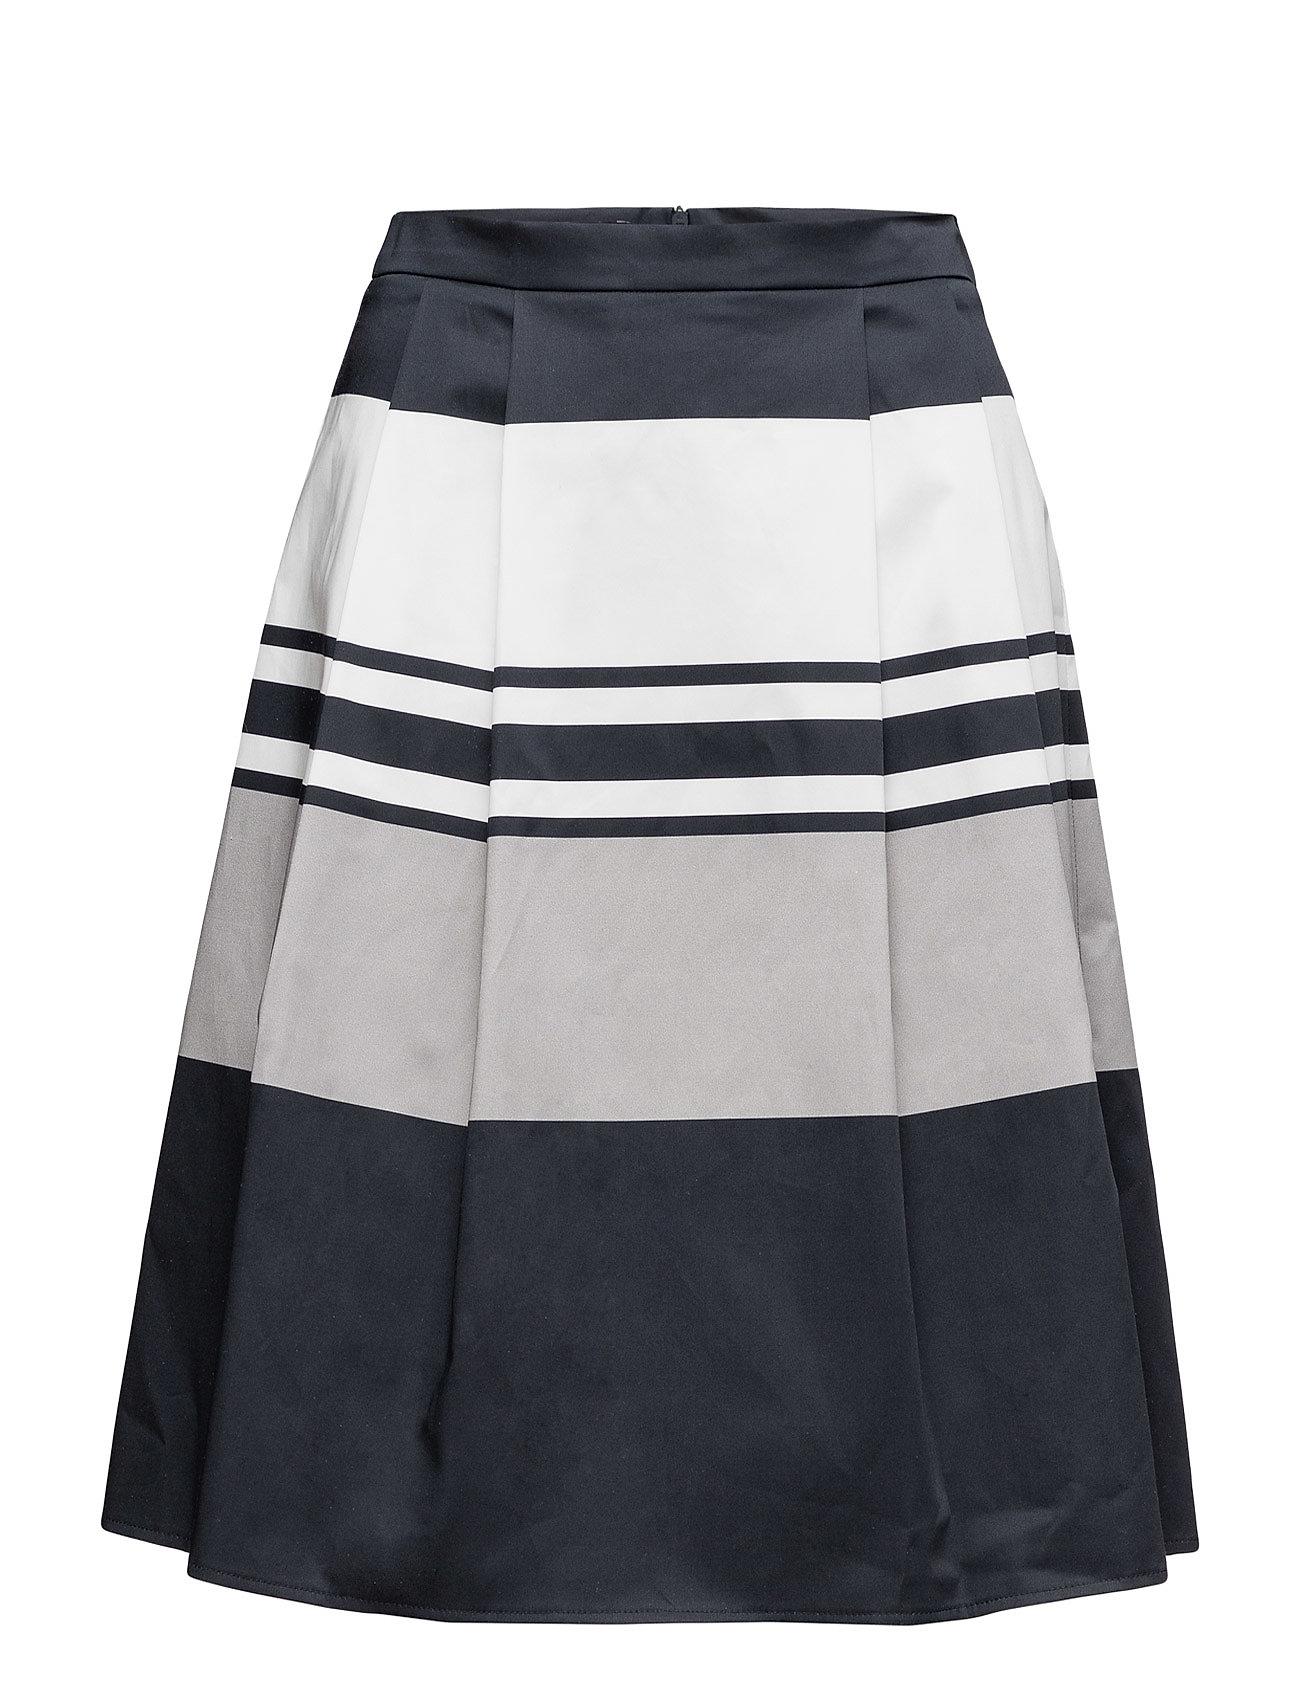 Skirt short woven fa fra taifun fra boozt.com dk